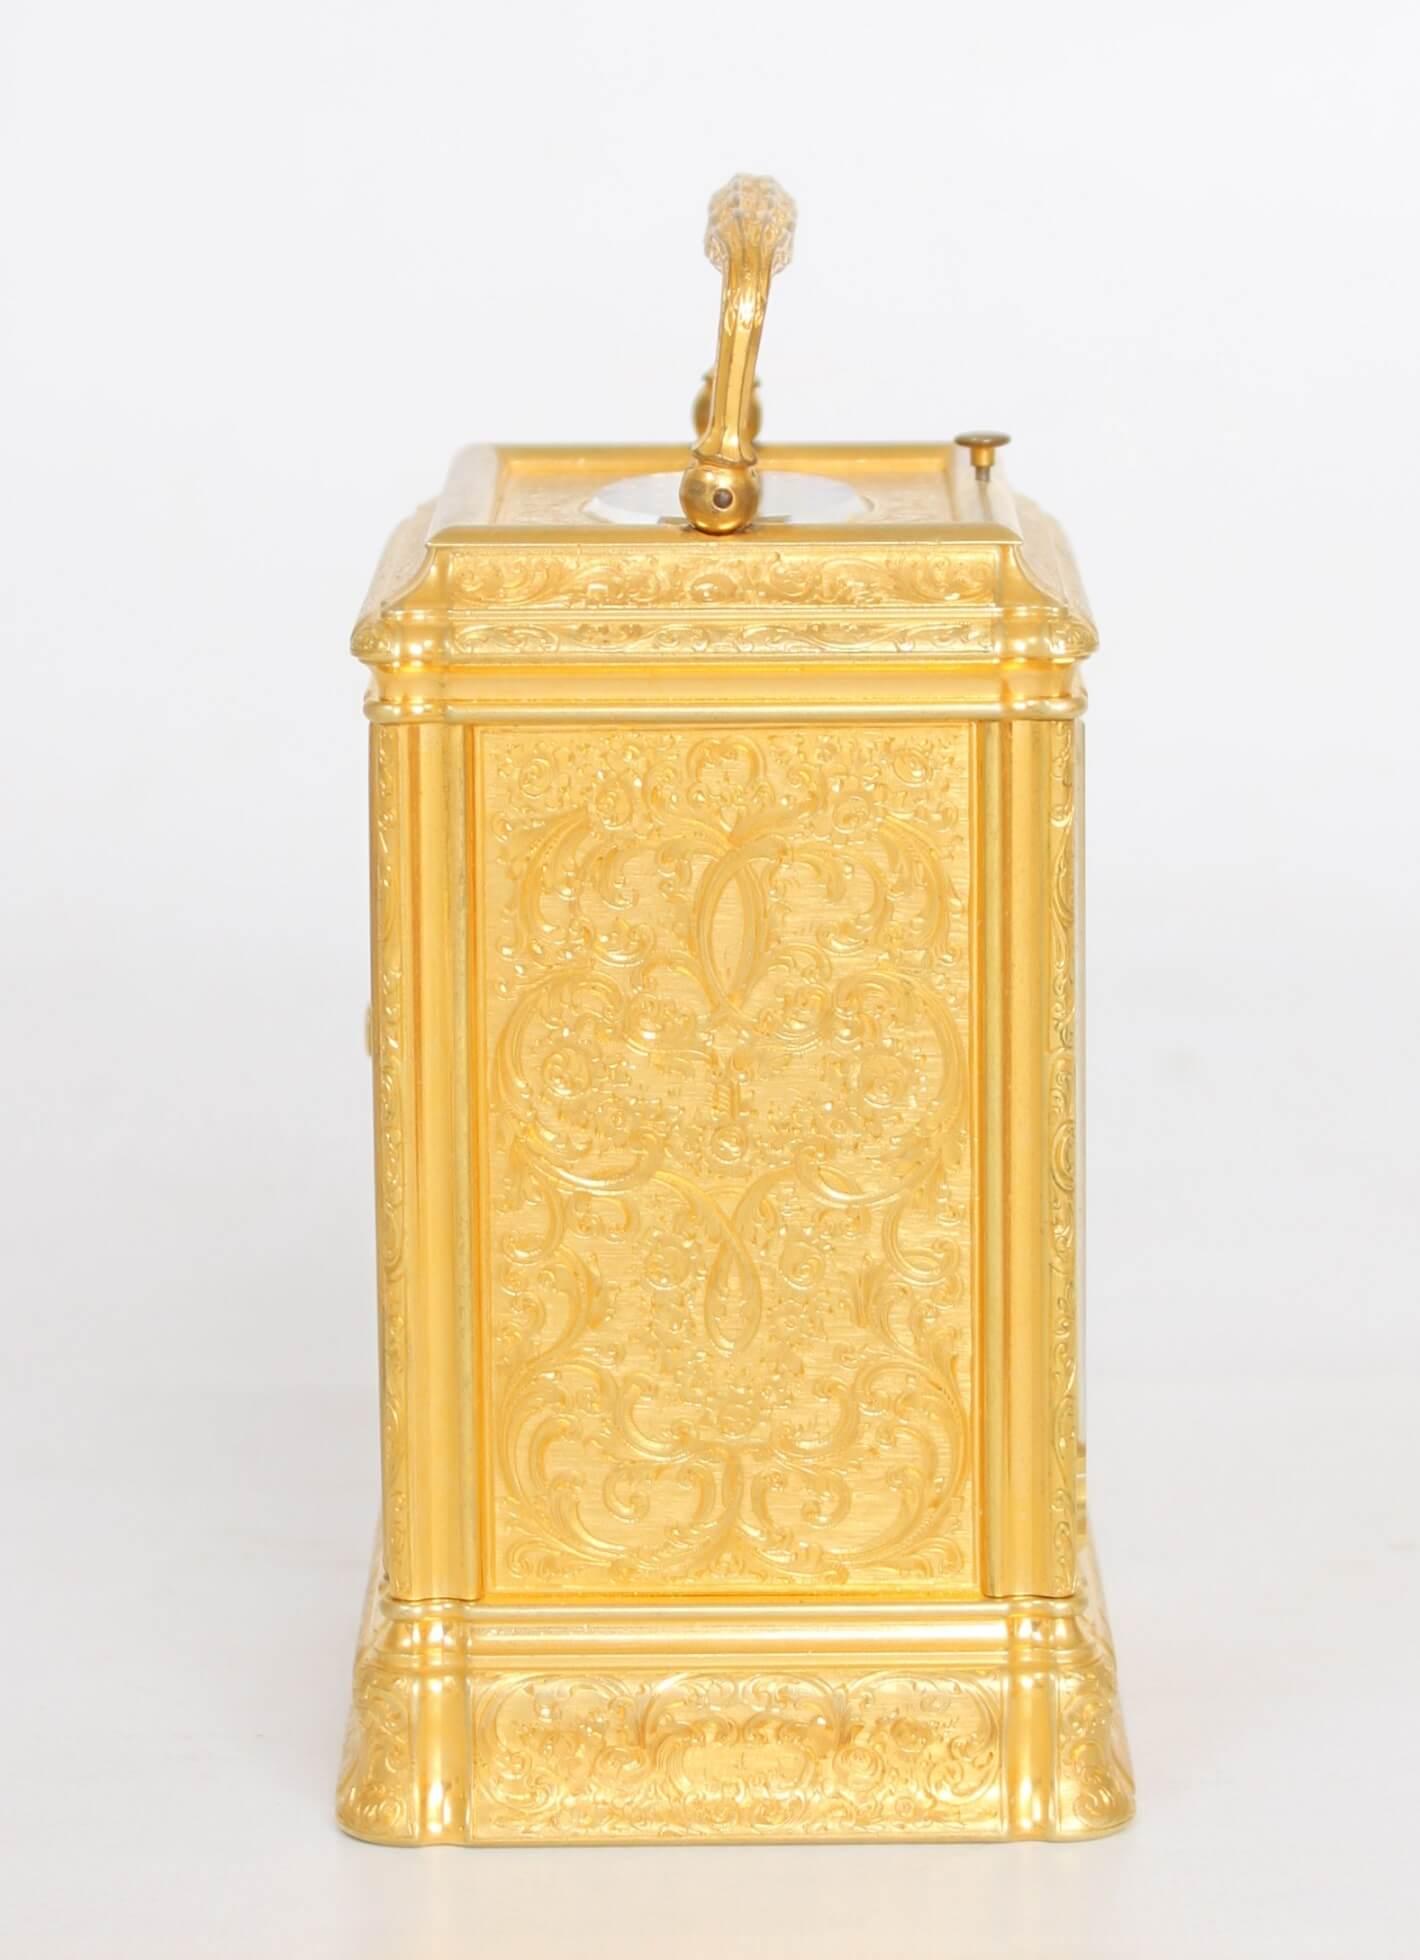 English-gorge case-carriage clock-quarter repeating-Dent-gilt brass-engraved